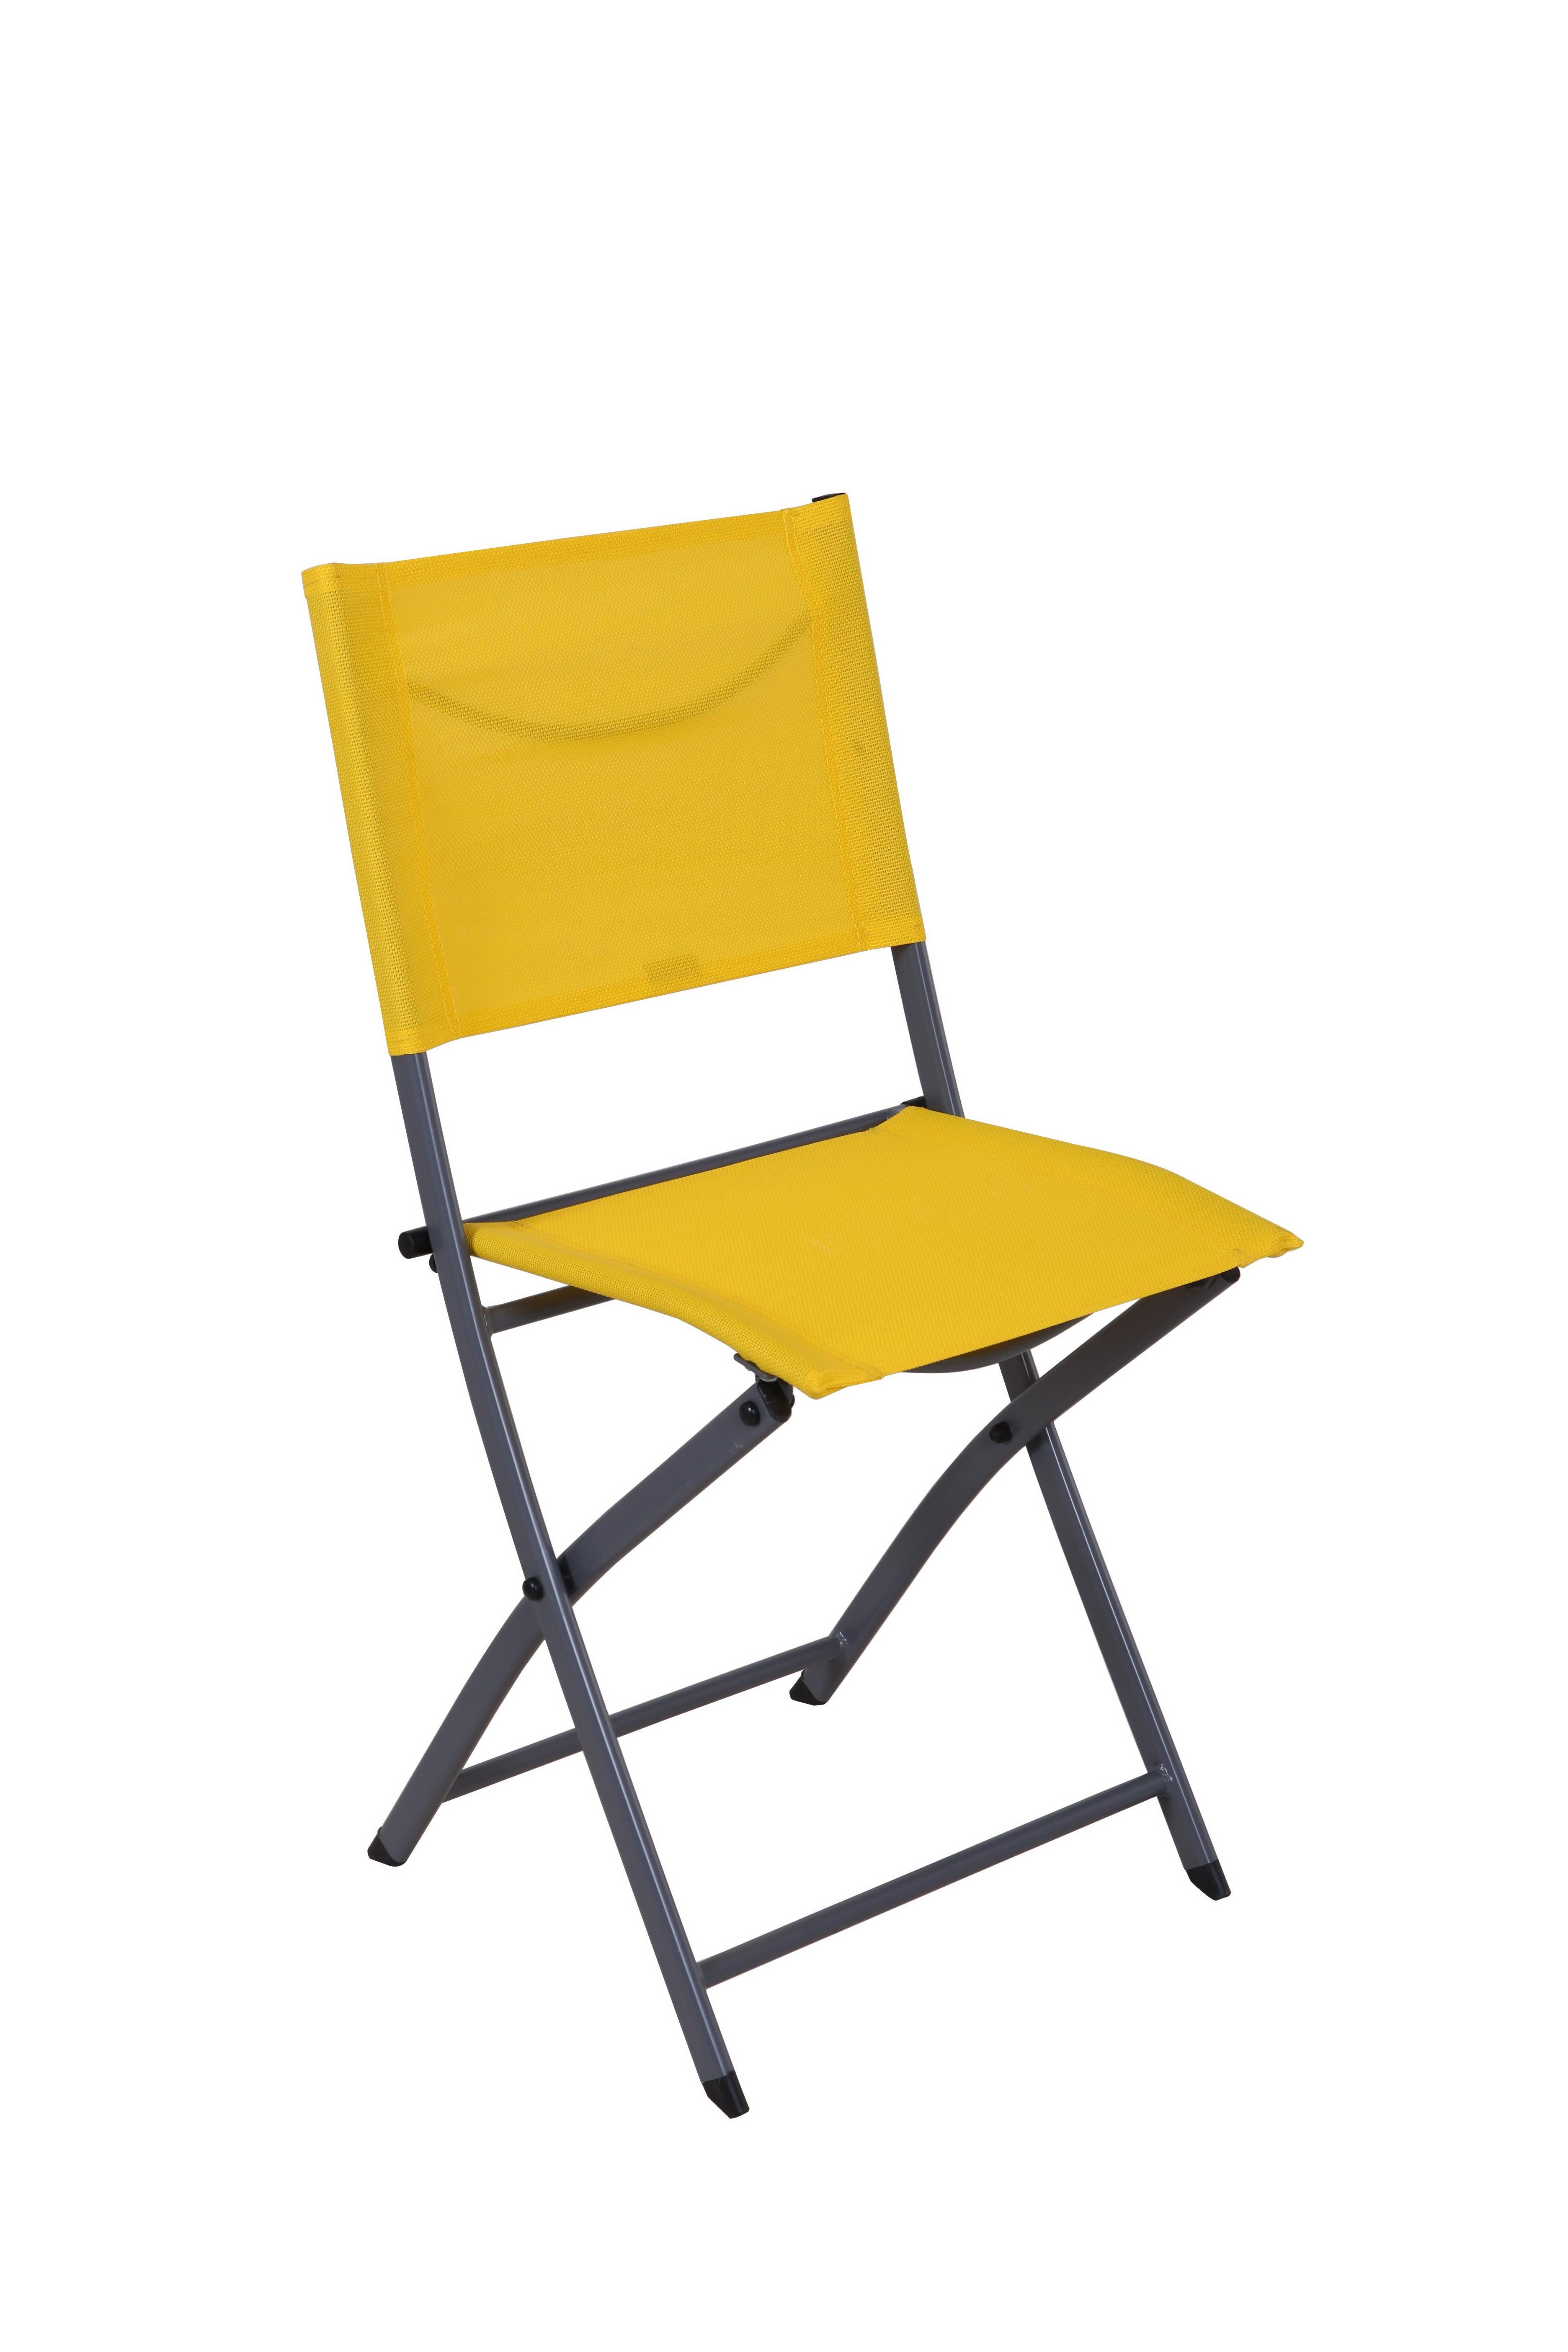 Chaise de jardin en acier Emys origami jaune